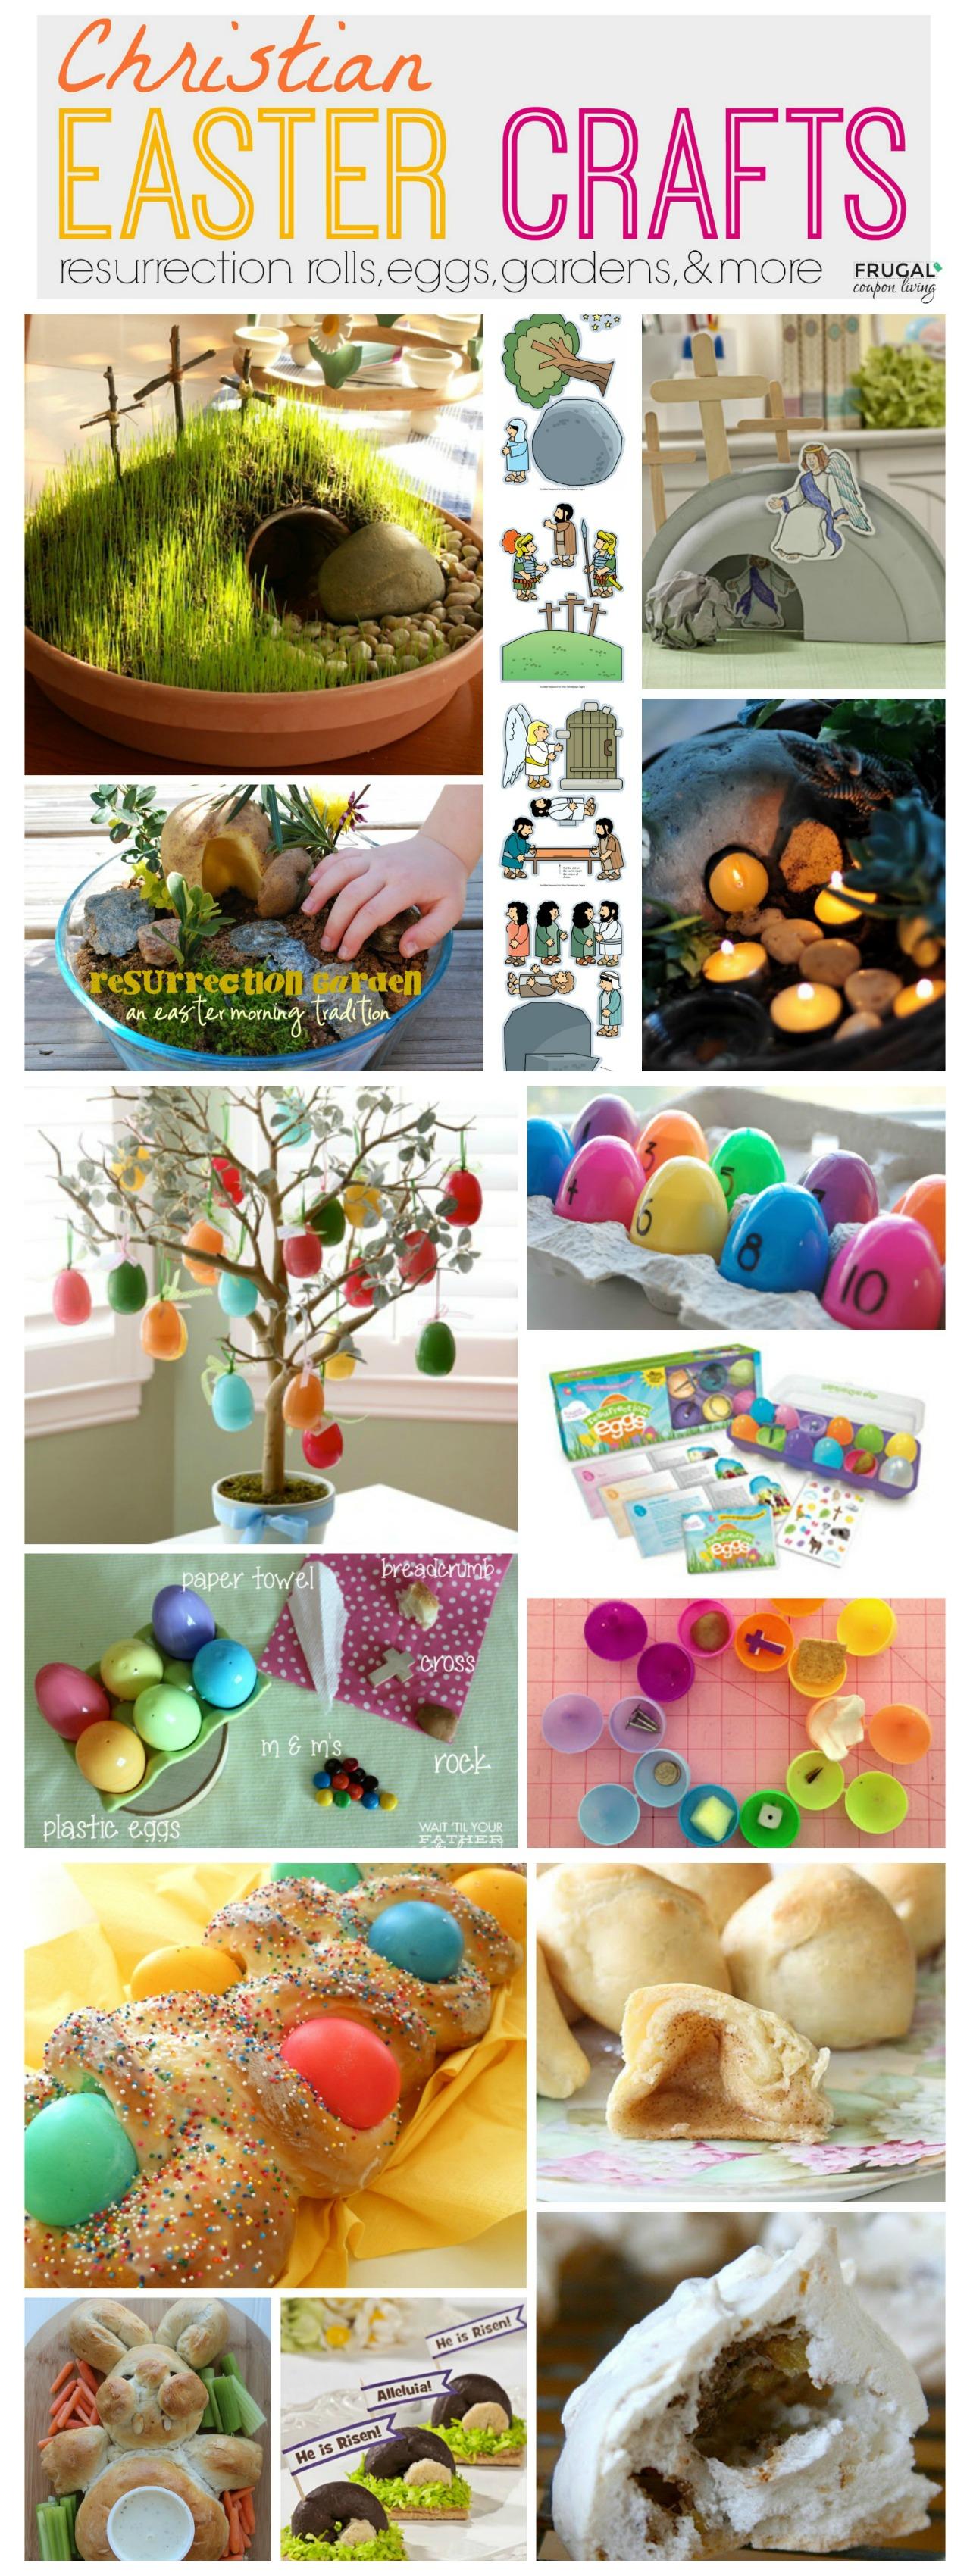 Christian-Easter-Crafts-Resurrection-Frugal-Coupon-Living